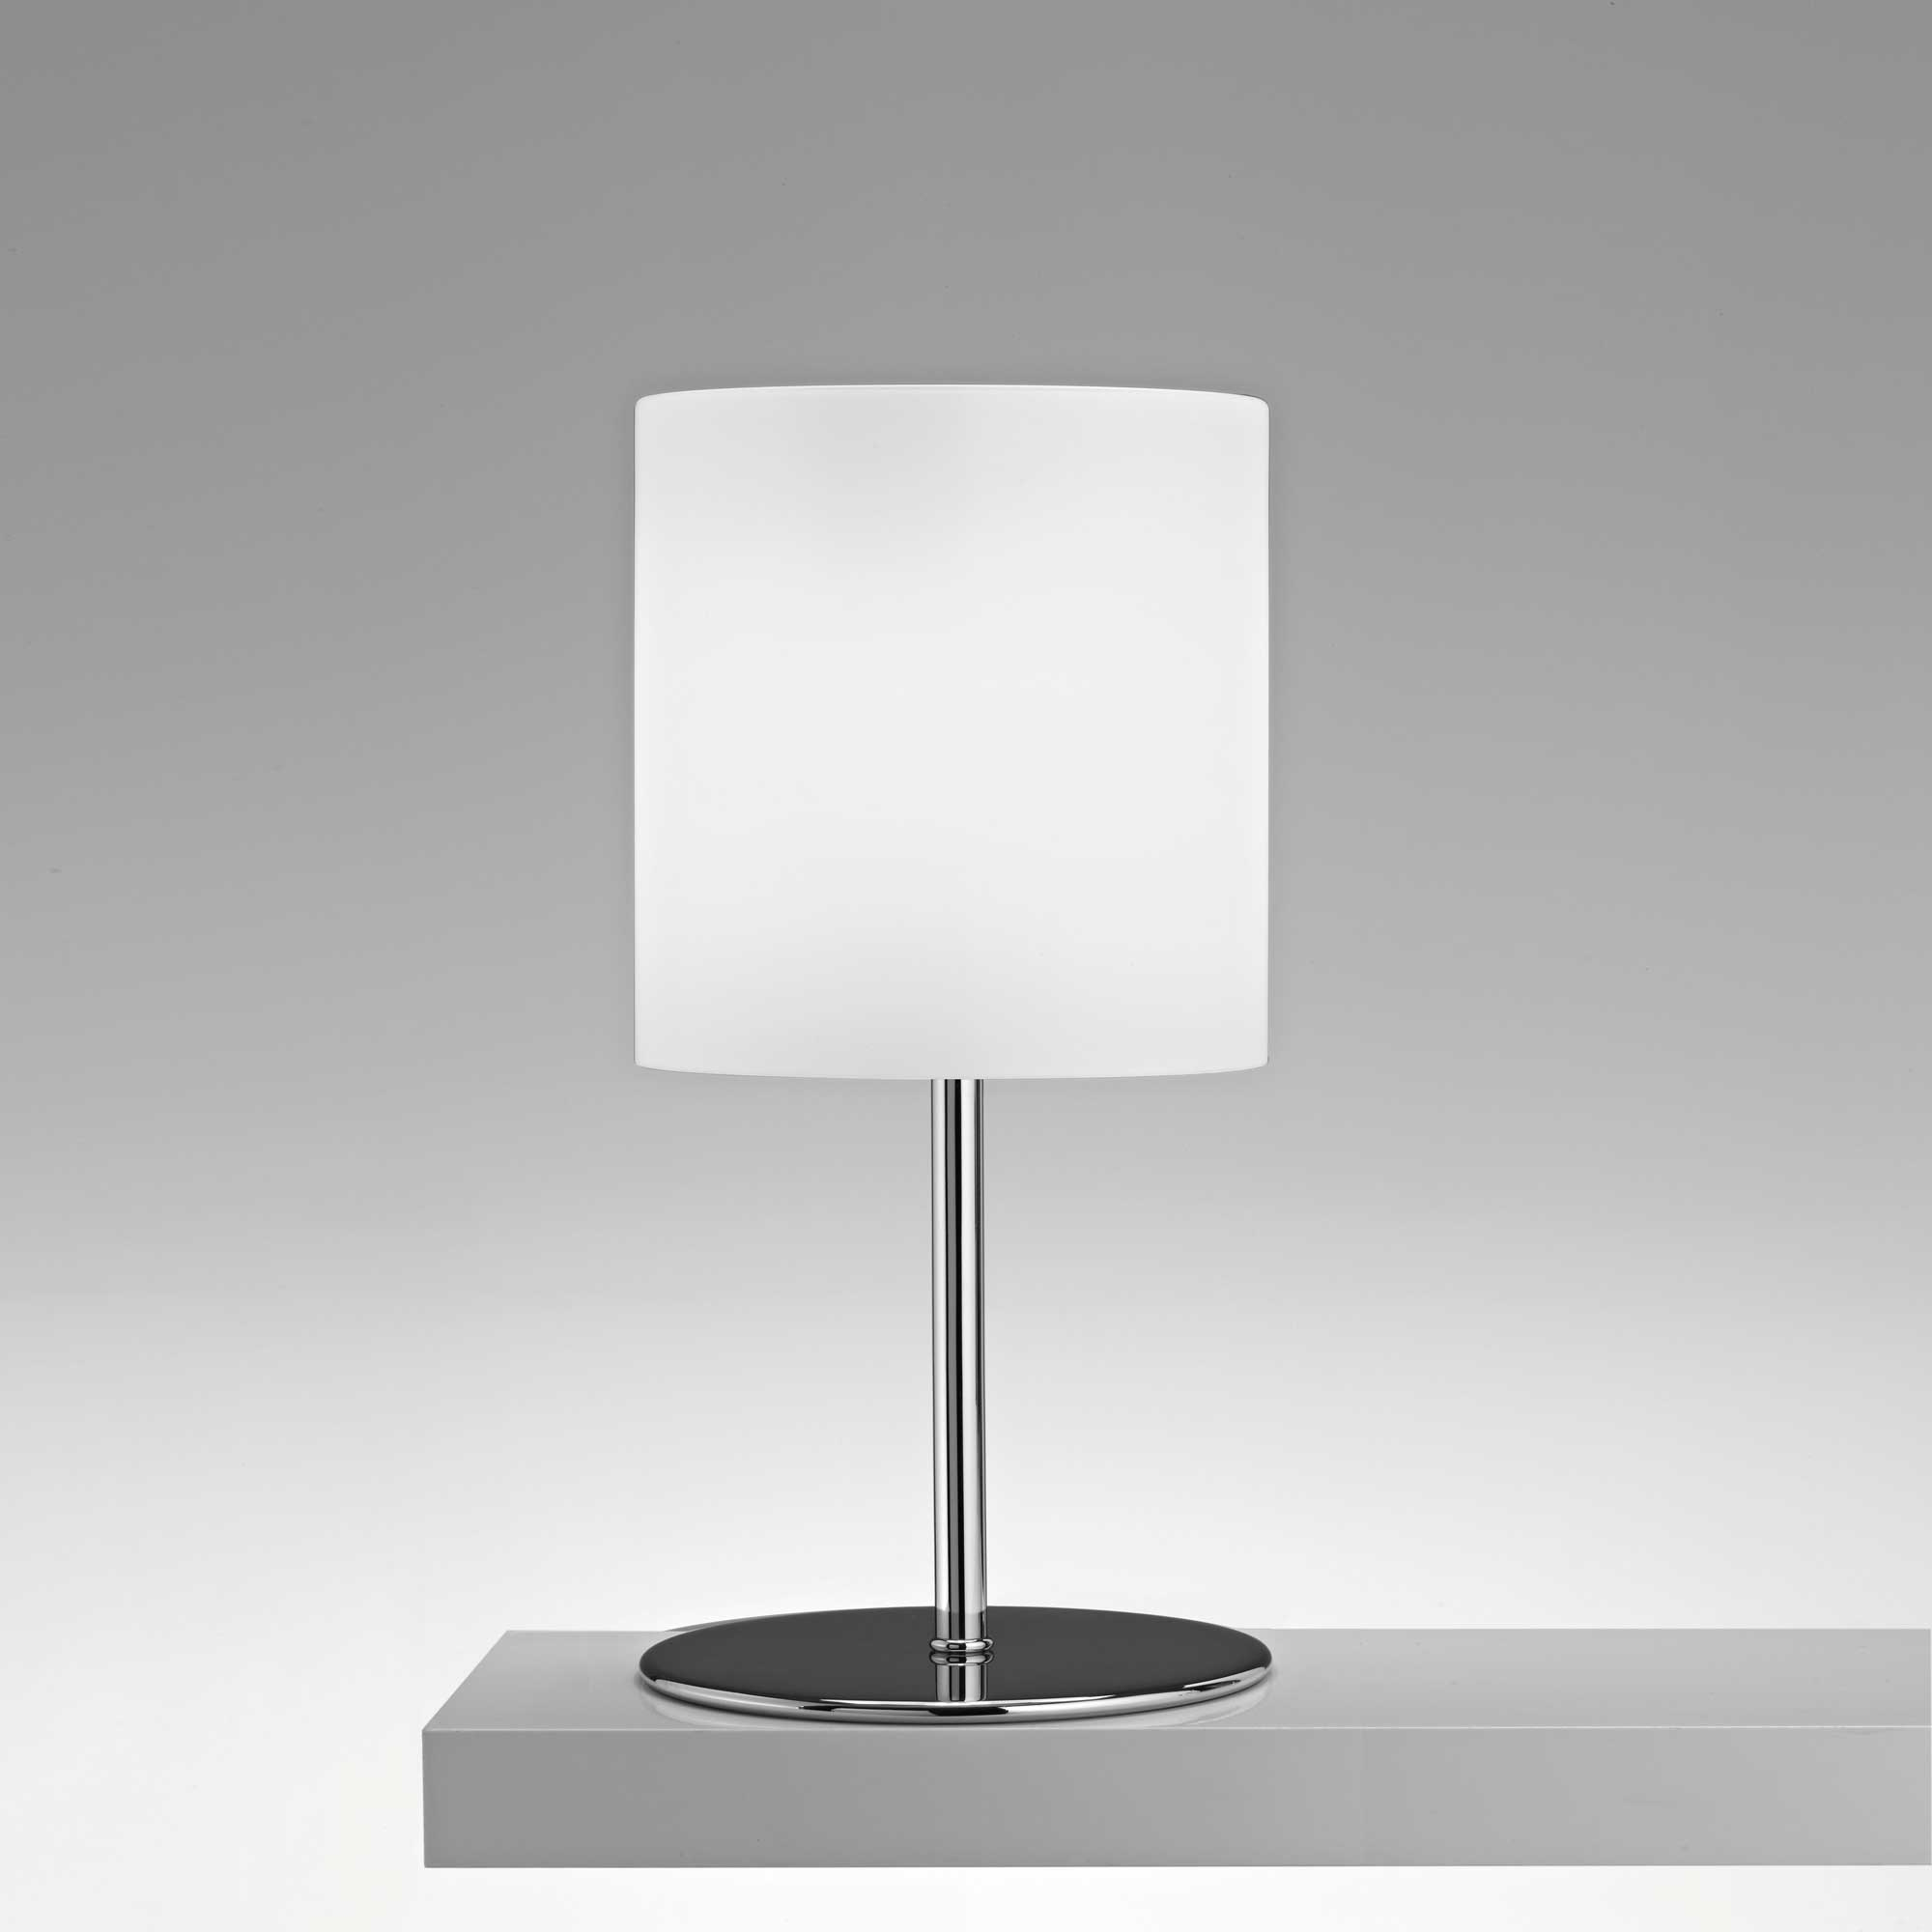 www.lightology.com img prod original 64167.jpg | Product ... for Lamp Product Photography  45hul